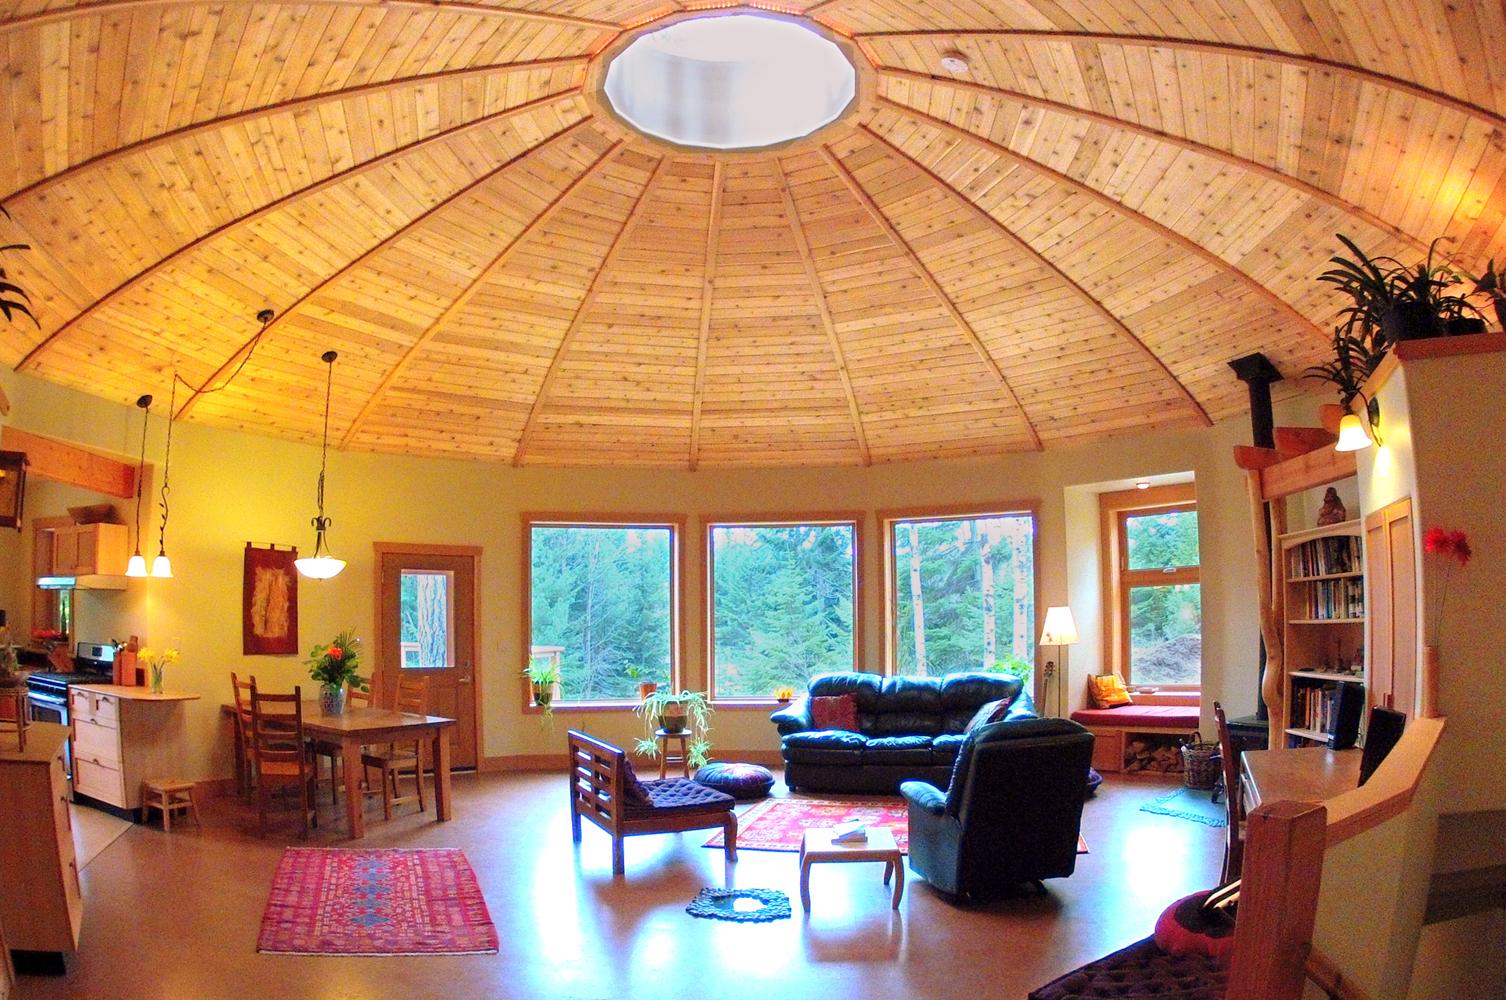 Interiors mandala homes prefab round homes energy for Round home designs